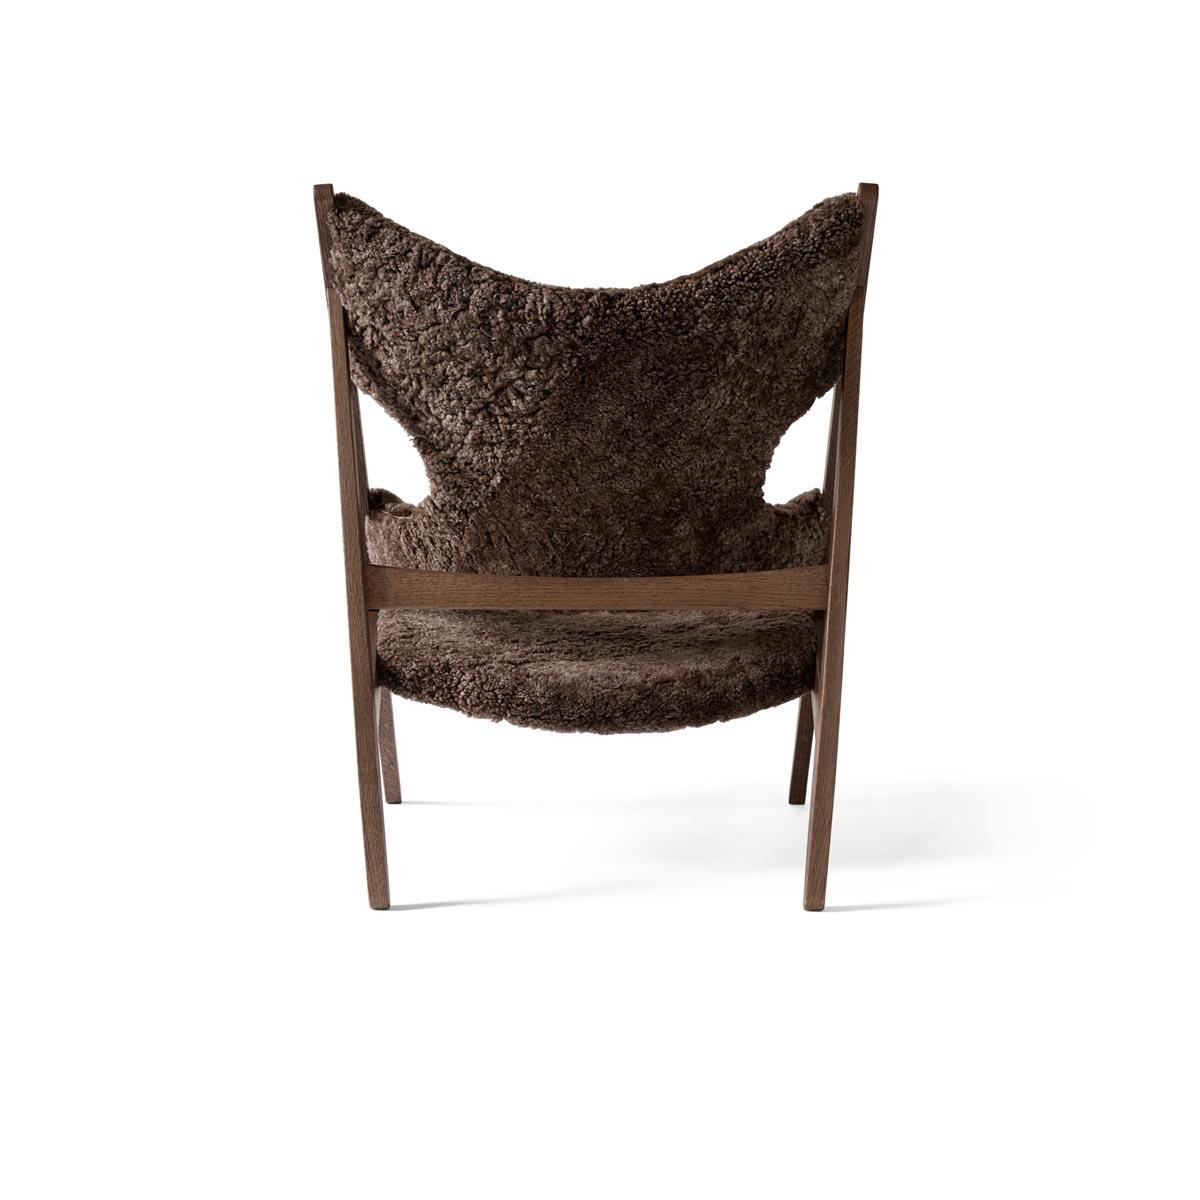 9680939 Knitting Lounge Chair Dark Stained Oak Drake 22 Back 1